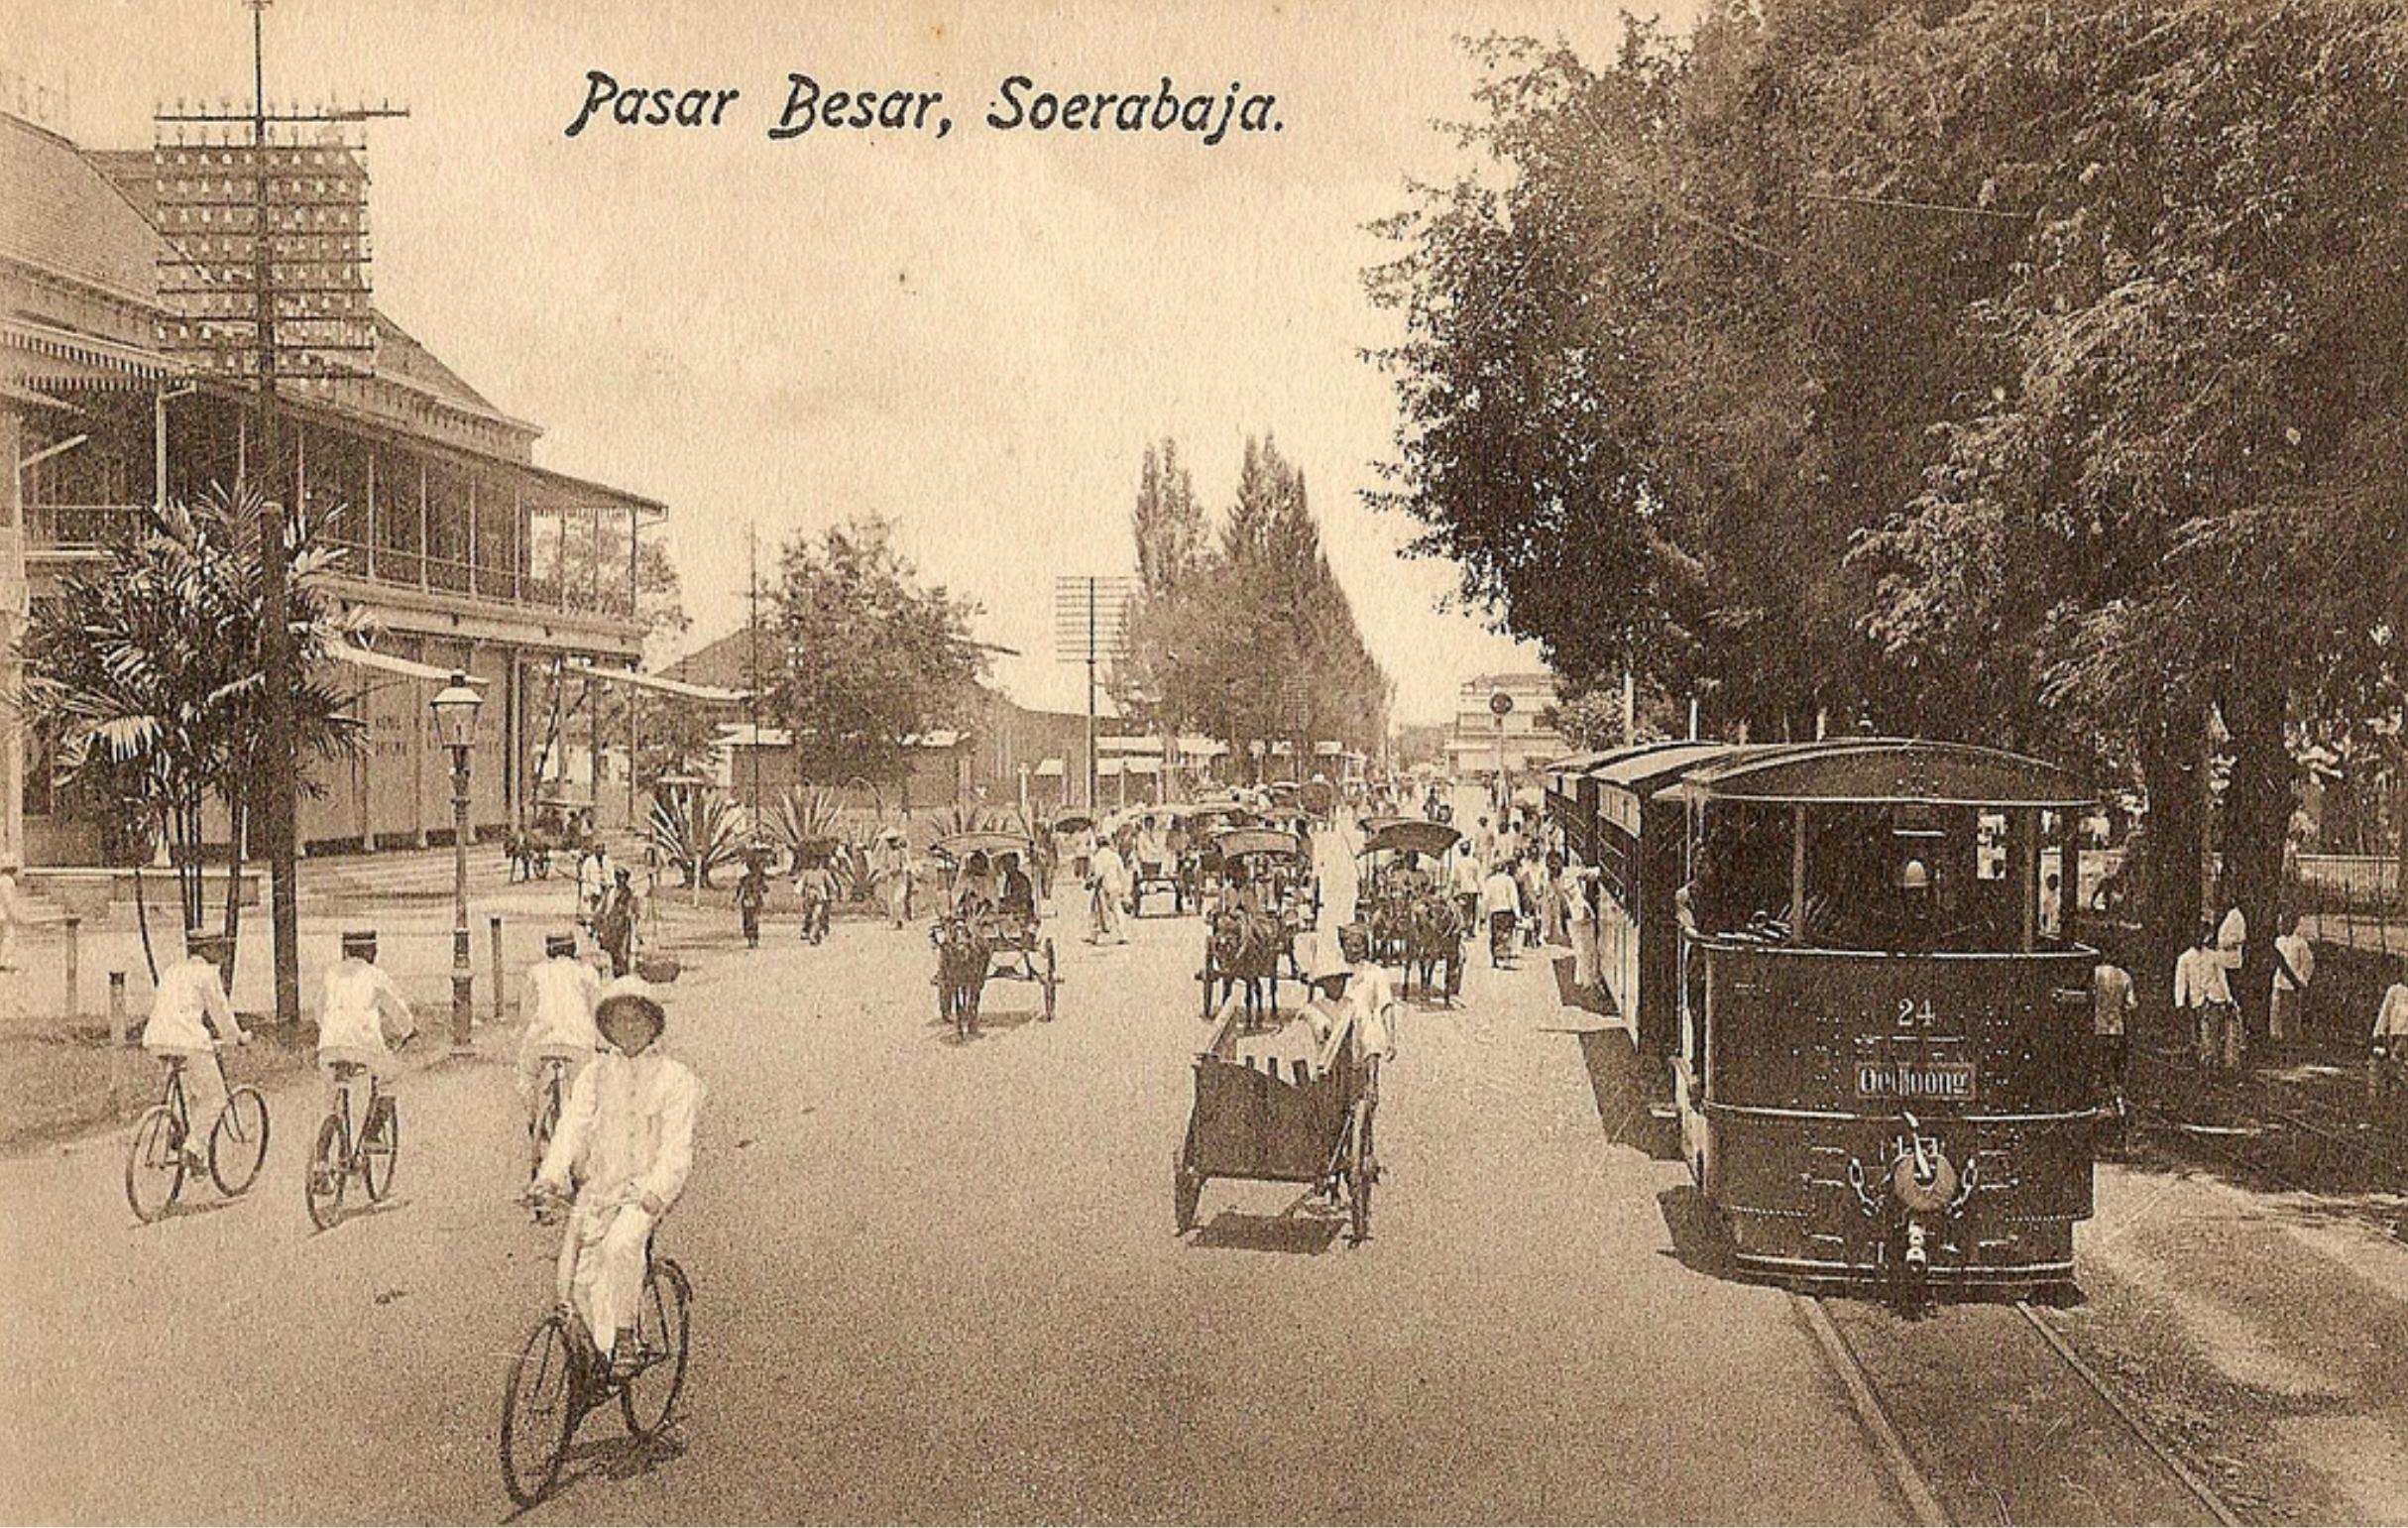 Pasar Besar Soerabaja Indonesia Sejarah Belanda